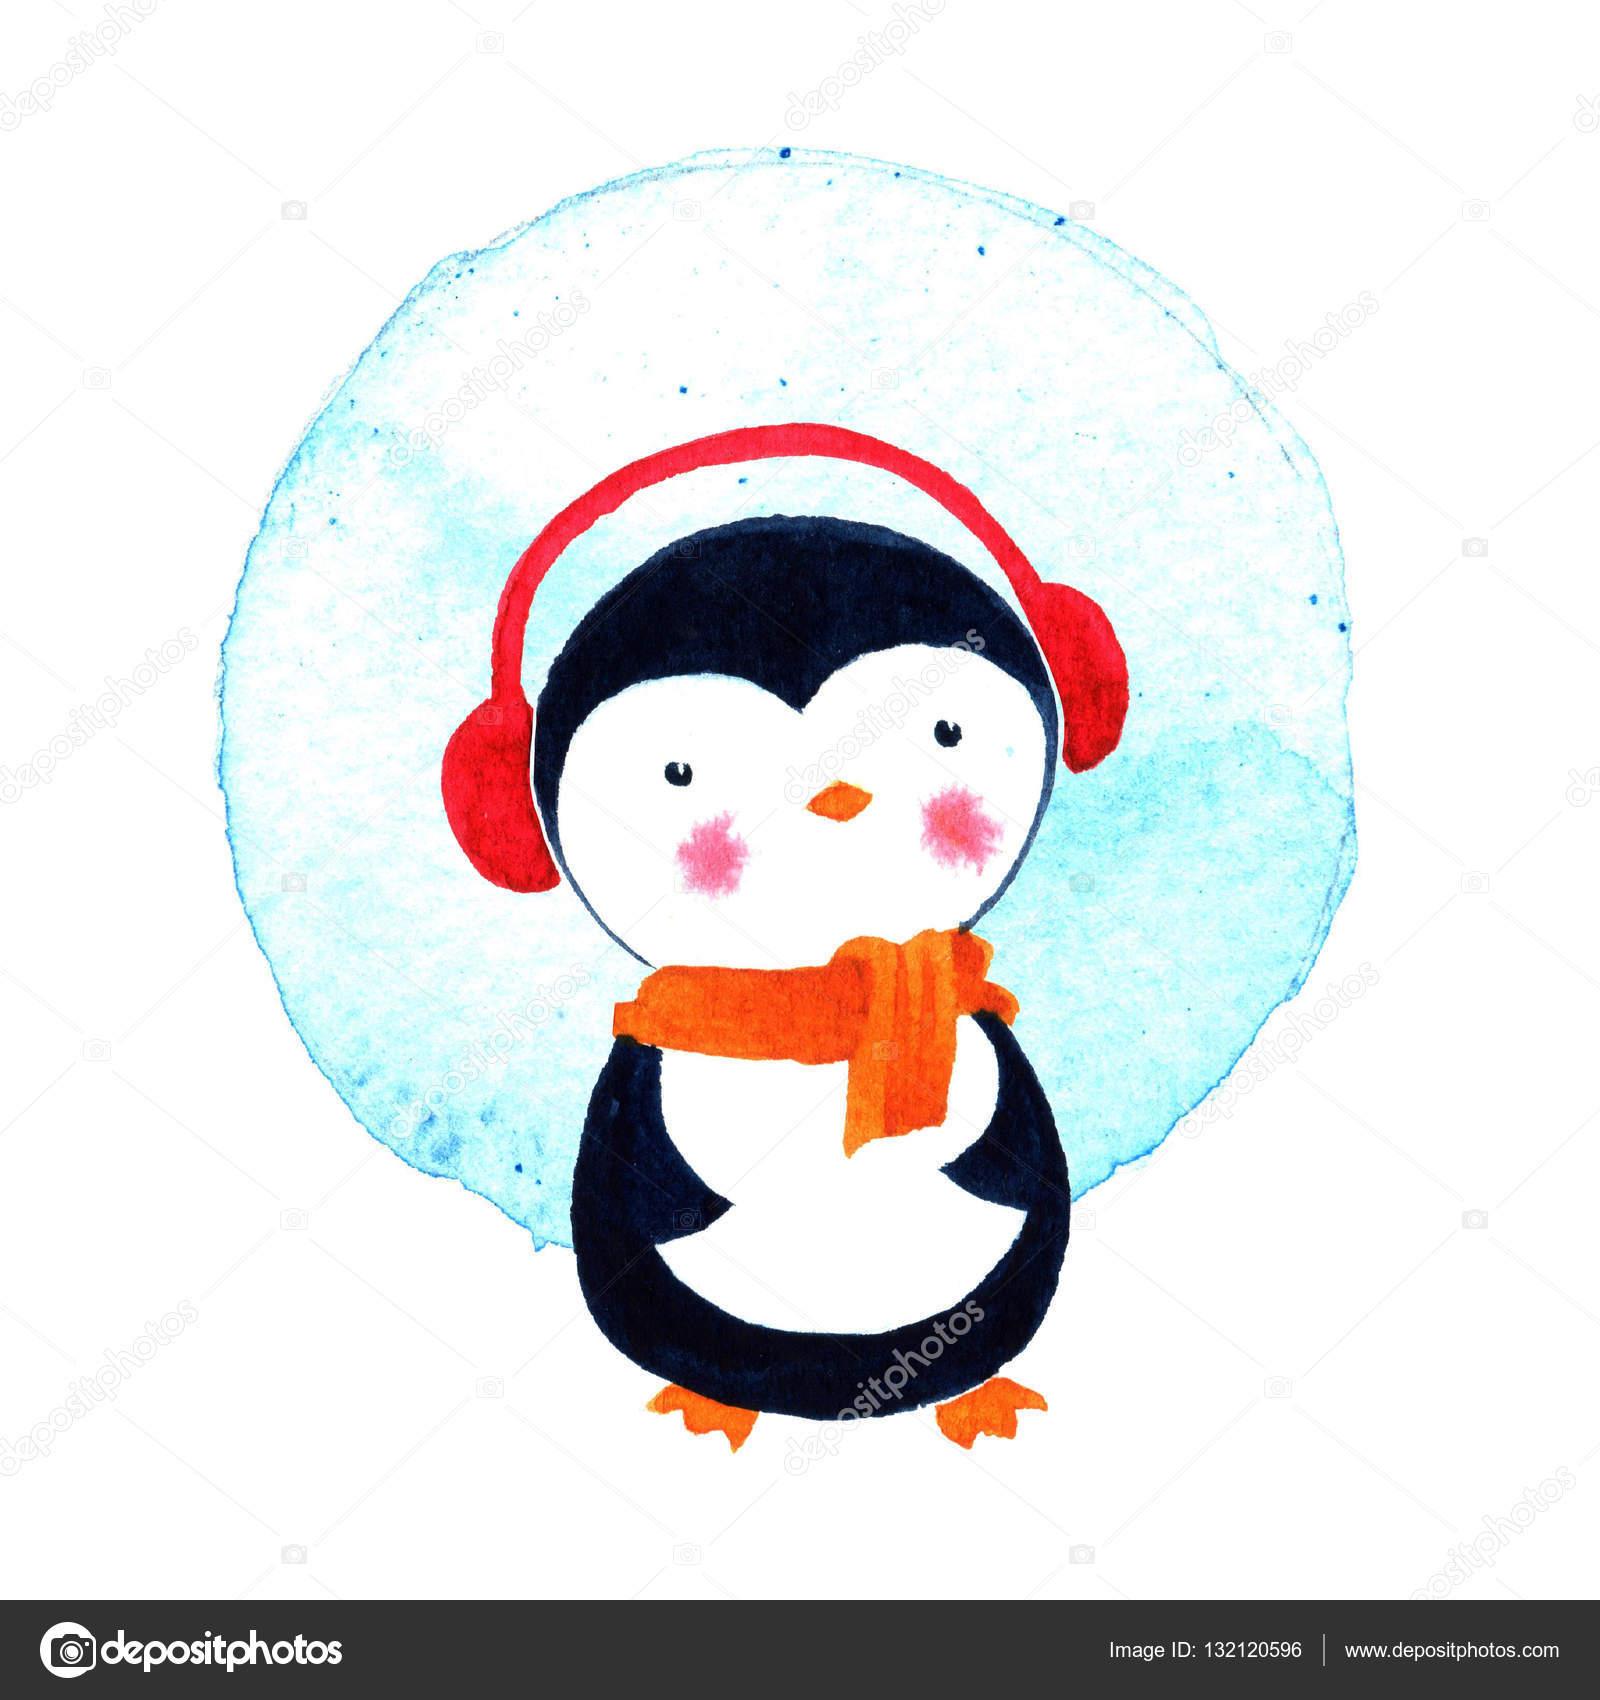 Ping ino de dibujos animados para beb s y ni os peque os - Dibujos para paredes de bebes ...